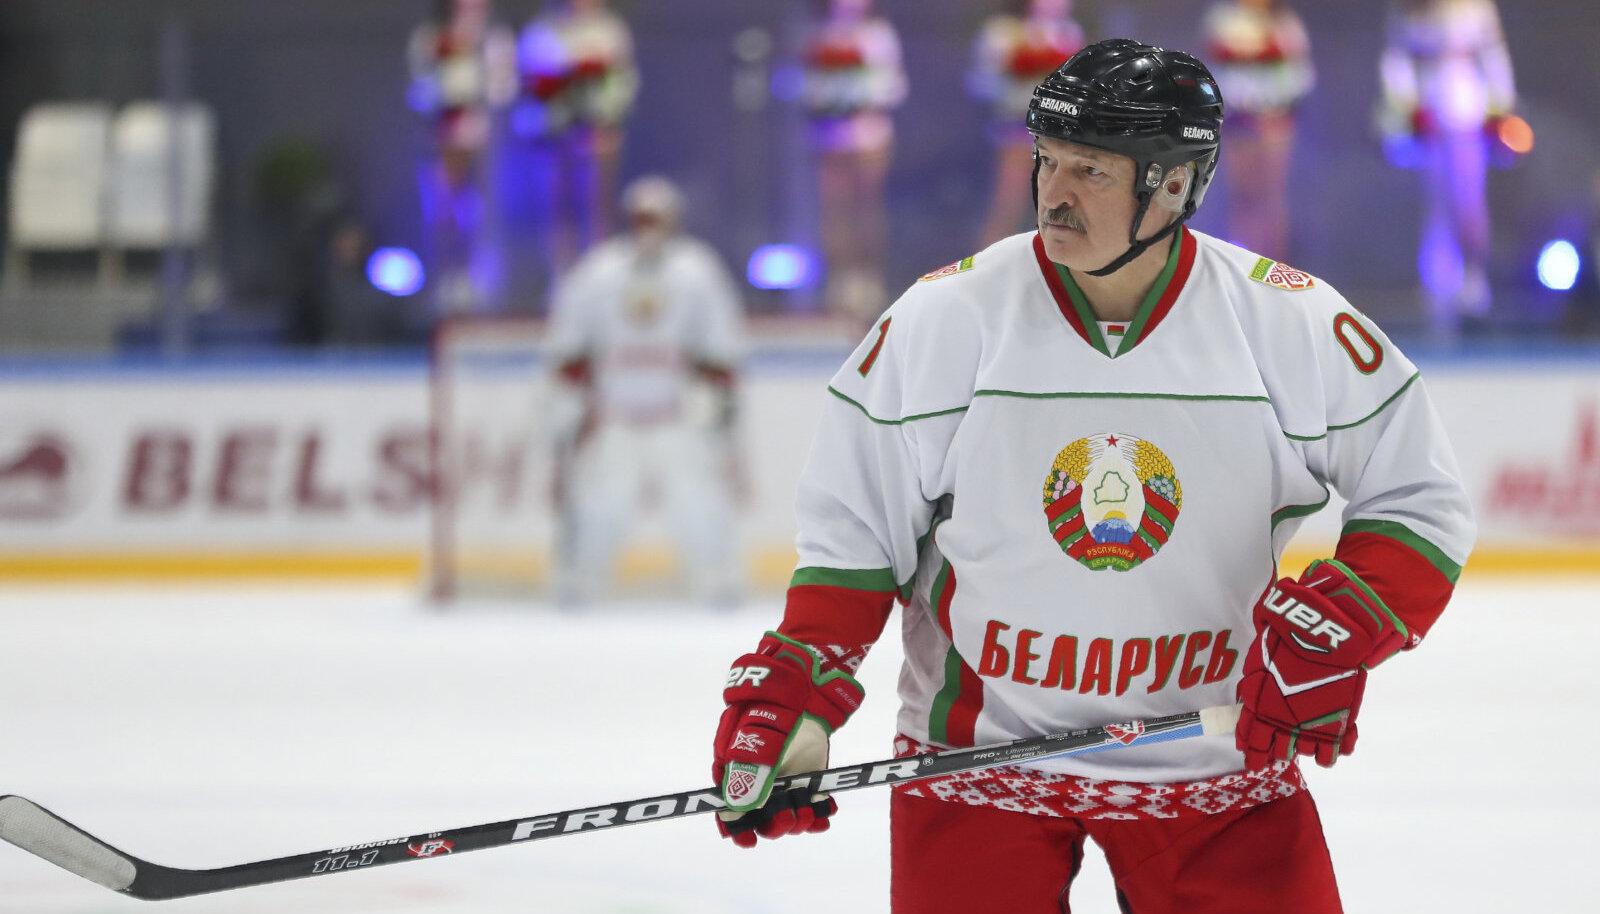 Aleksandr Lukašenka